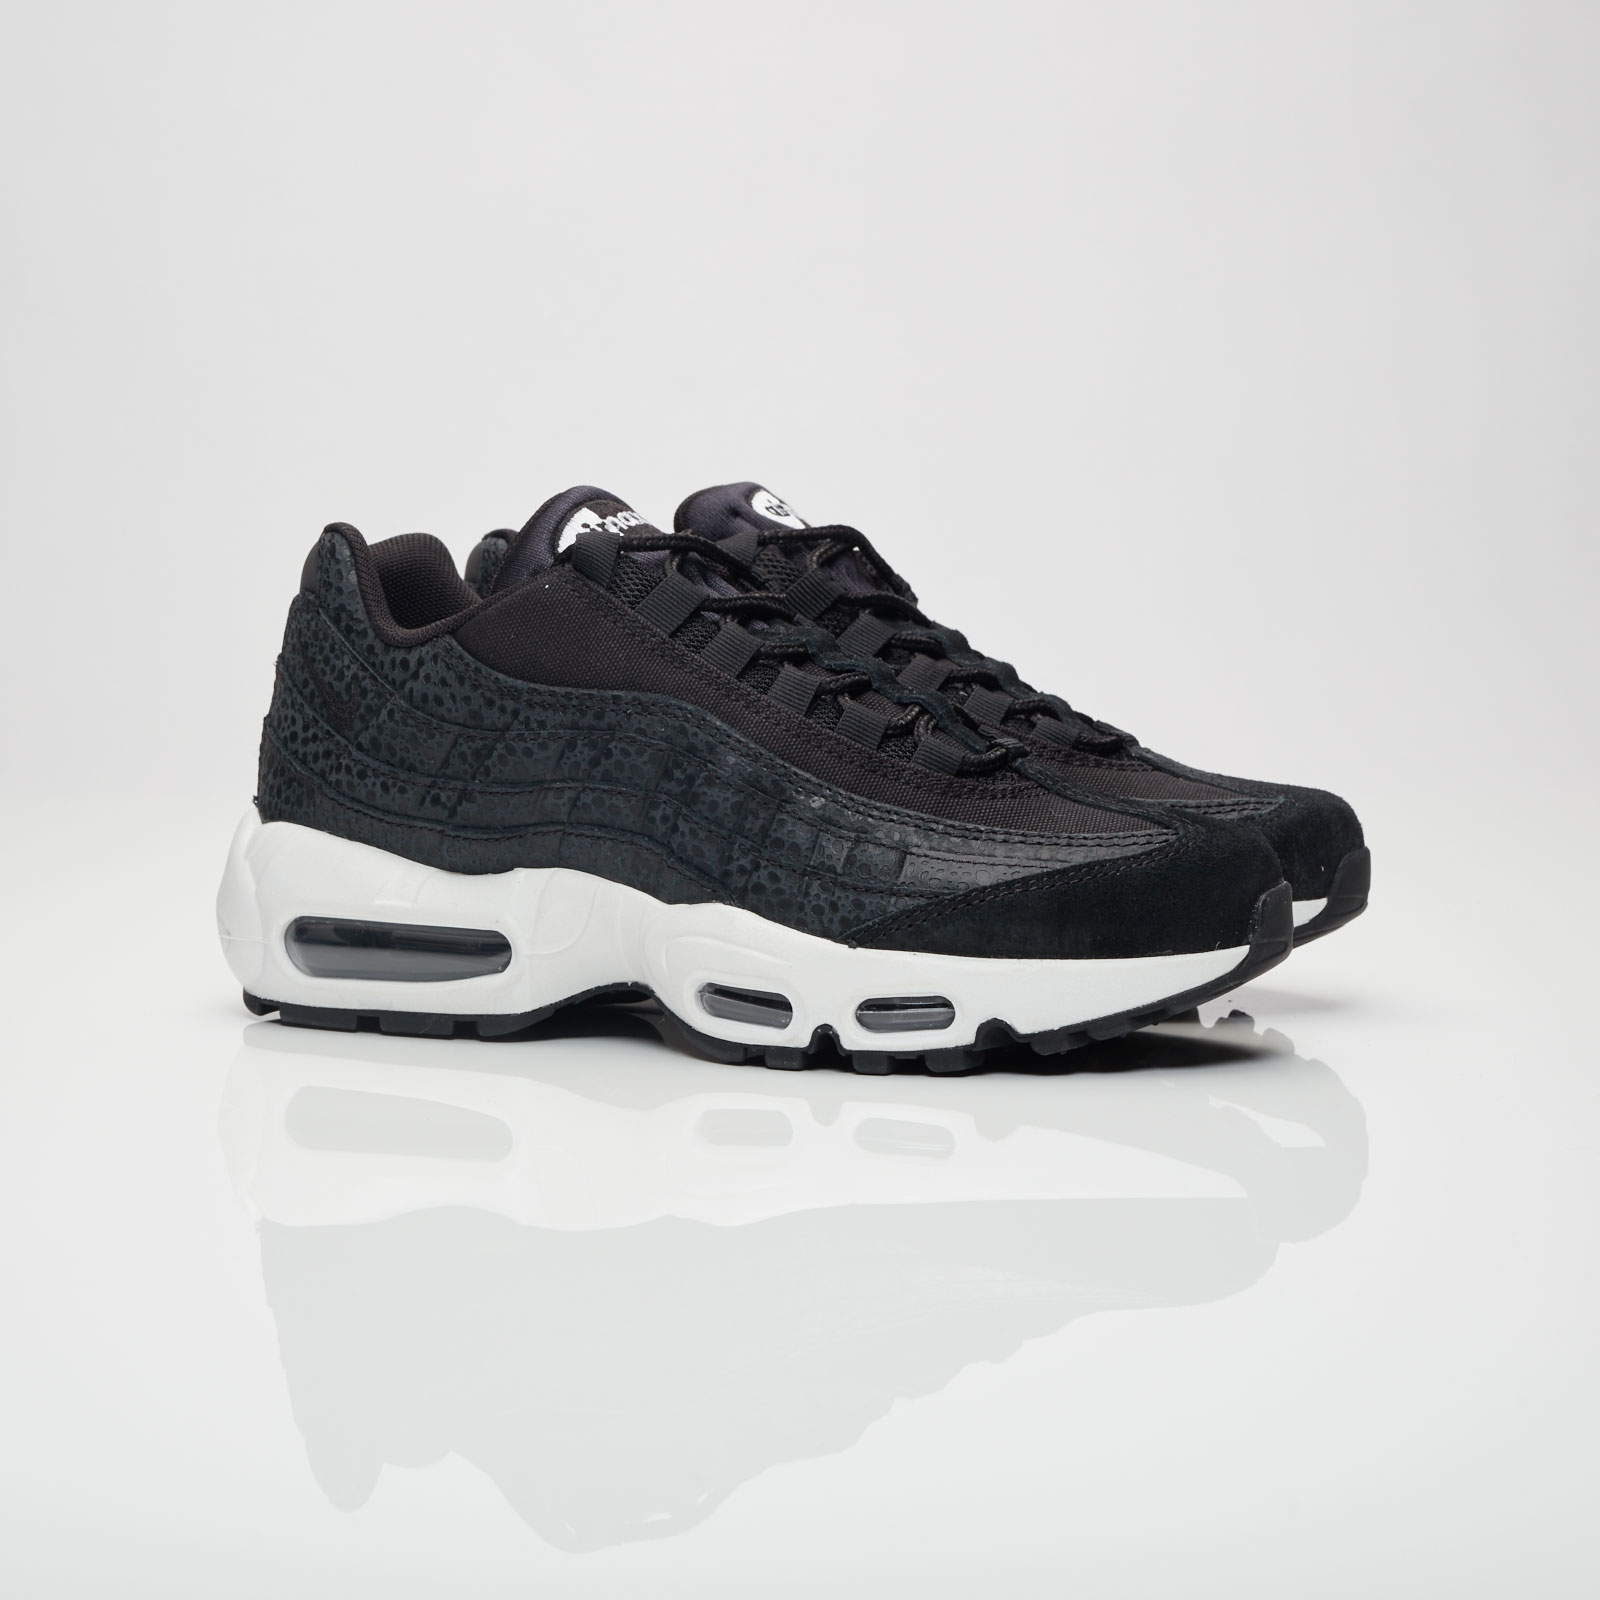 d0c81aa933 Nike Wmns Air Max 95 Premium - 807443-010 - Sneakersnstuff ...